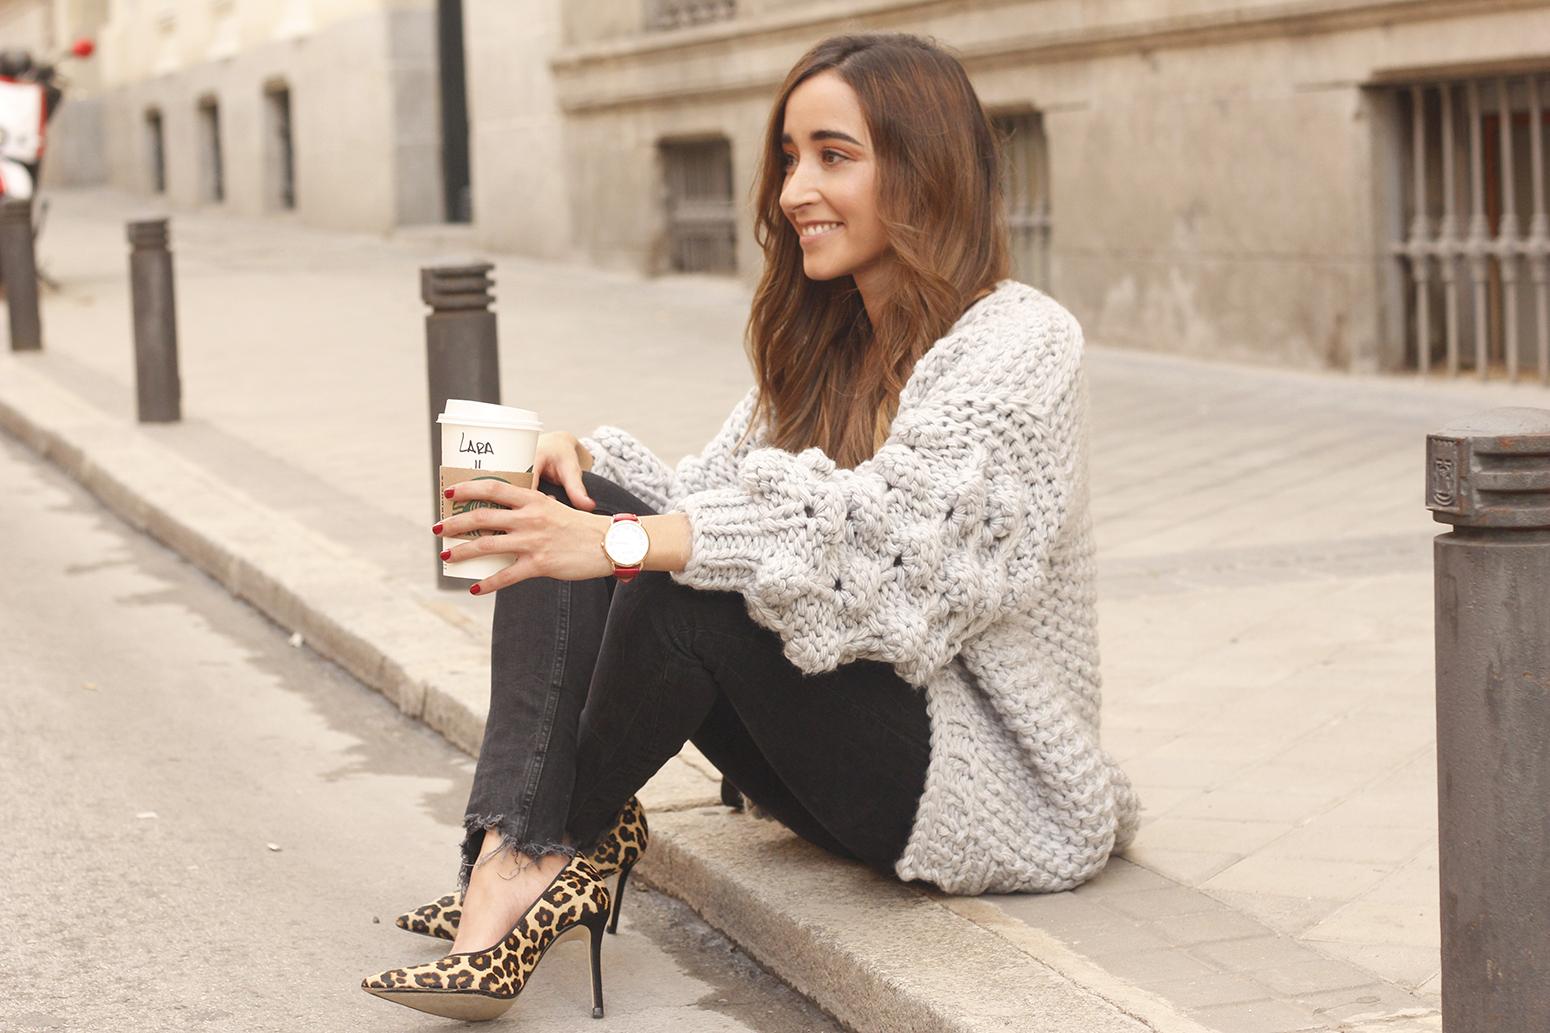 Grey cardigan black jeans folli folie watch leopard print heels starbucks tea street style fall outfit 201812